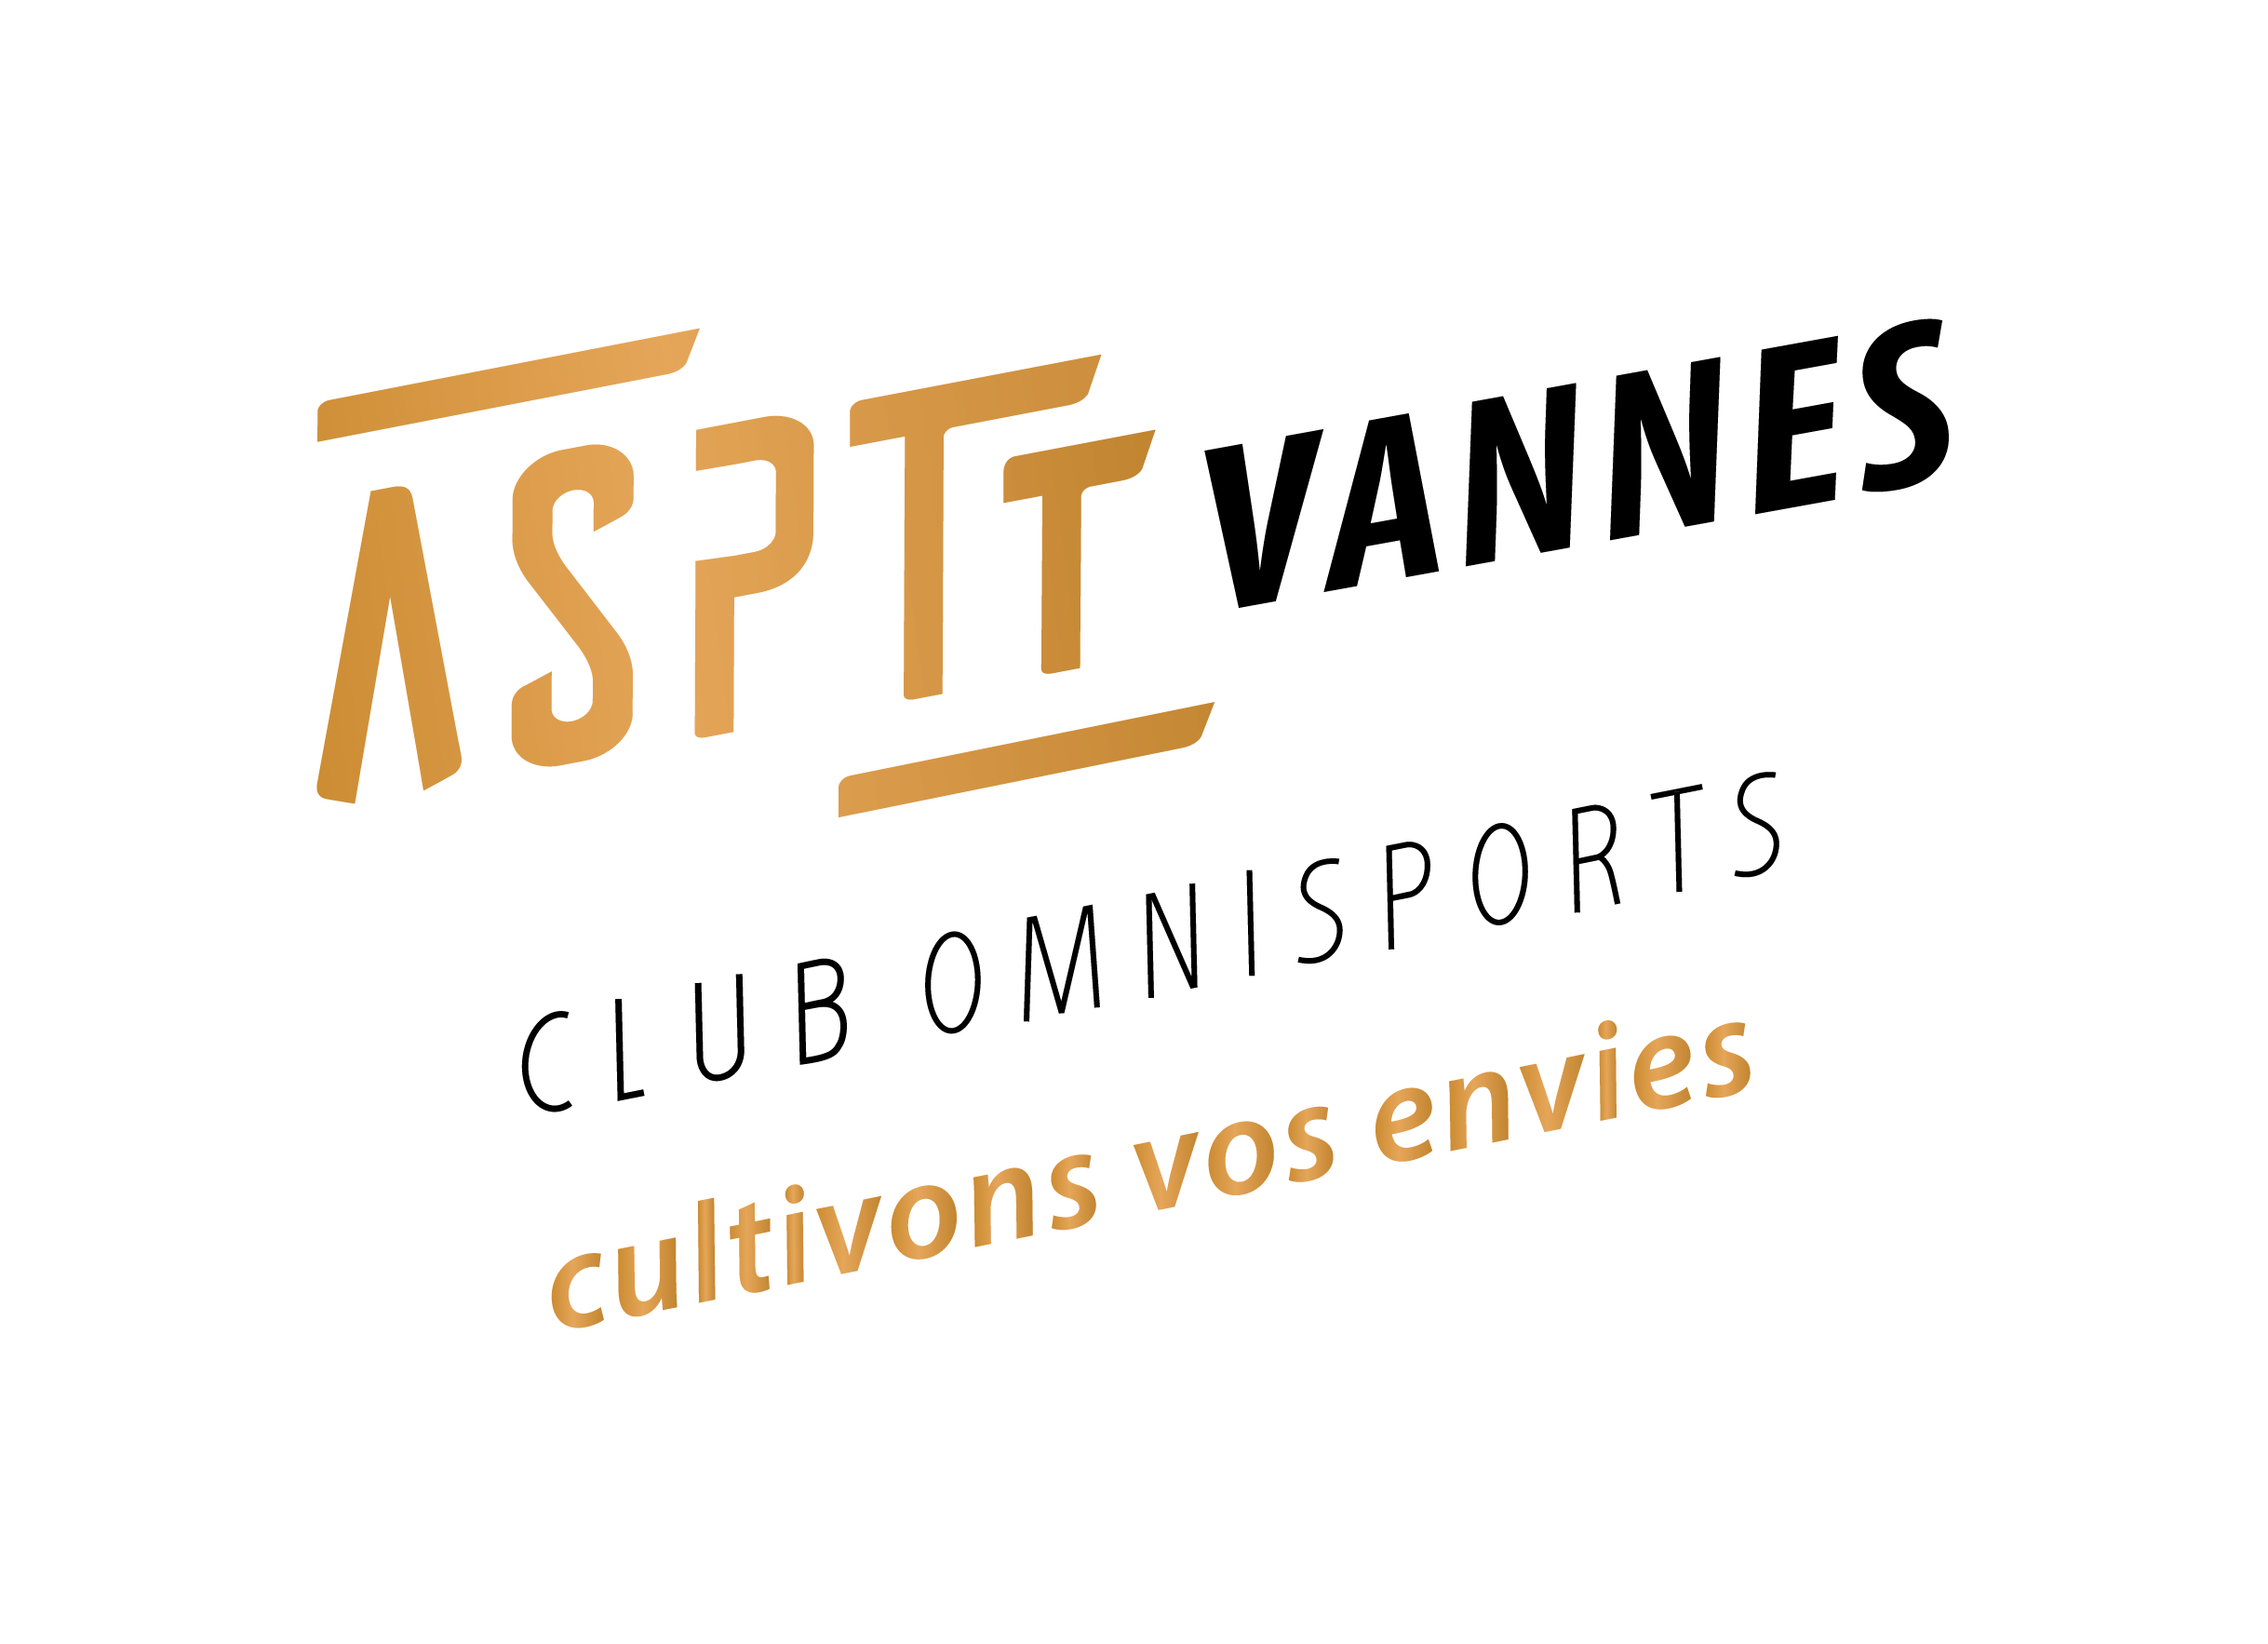 ASPTT Vannes